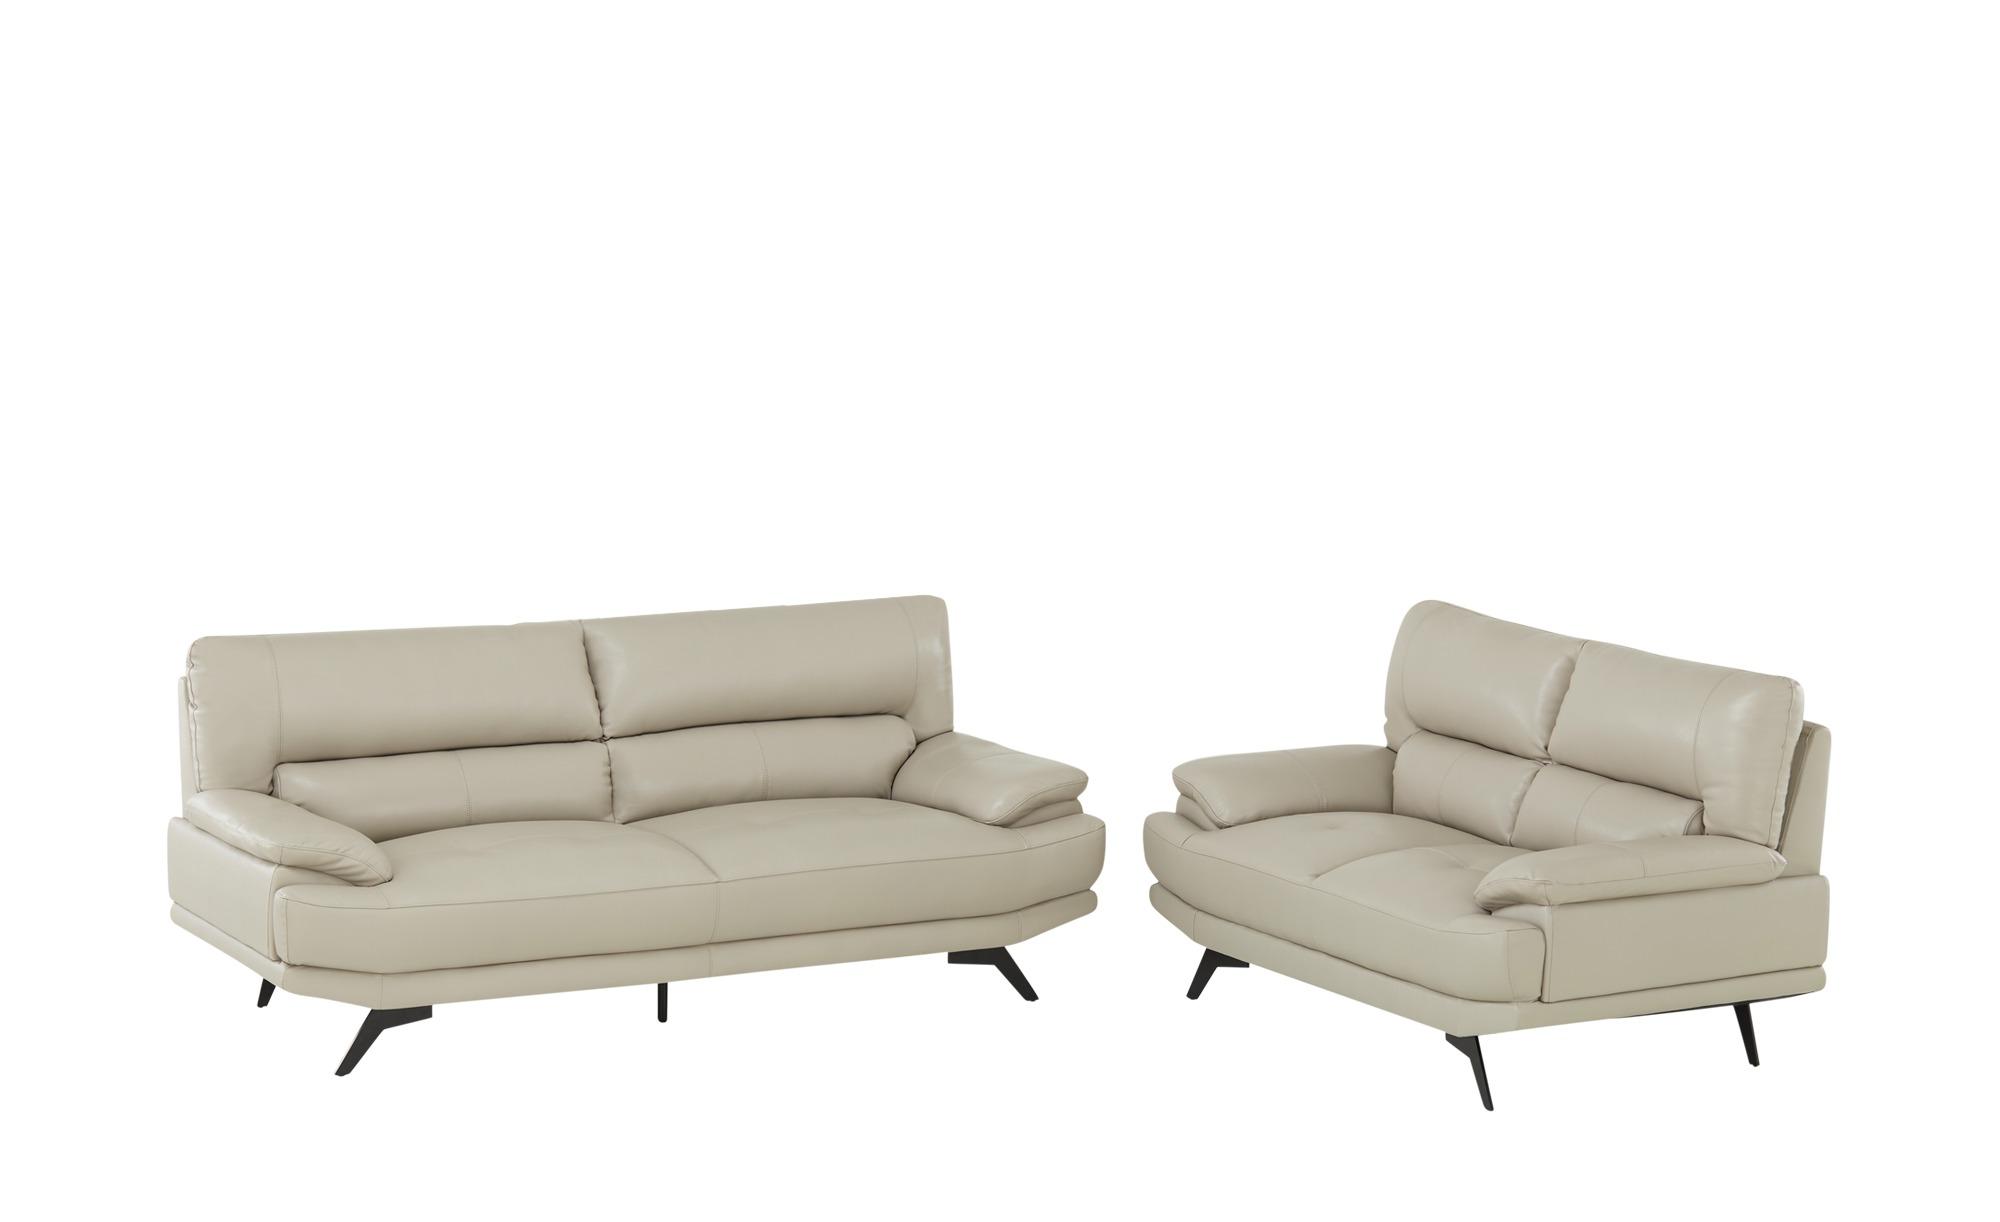 uno Sitzgruppe Leder  Lisa ¦ beige ¦ Maße (cm): H: 92 T: 92,5 Polstermöbel > Sofas > Sitzgruppen - Höffner